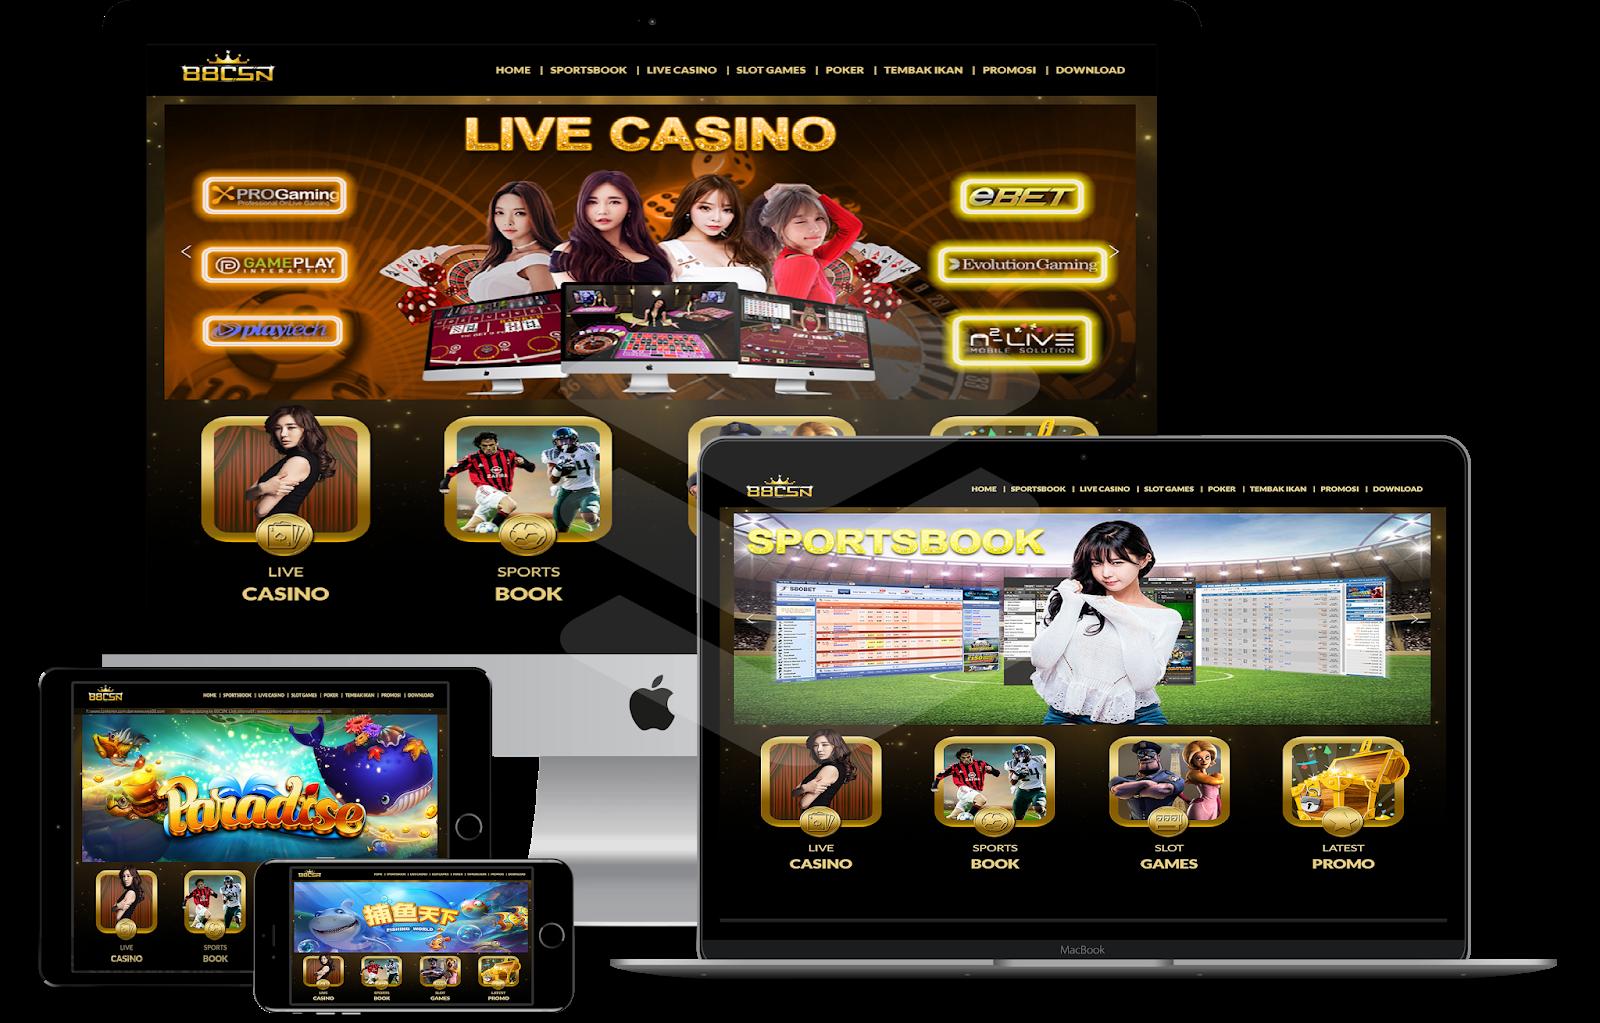 WE LOVE TO GAMES - Agen Slot Terbaik - Situs Judi Online ...